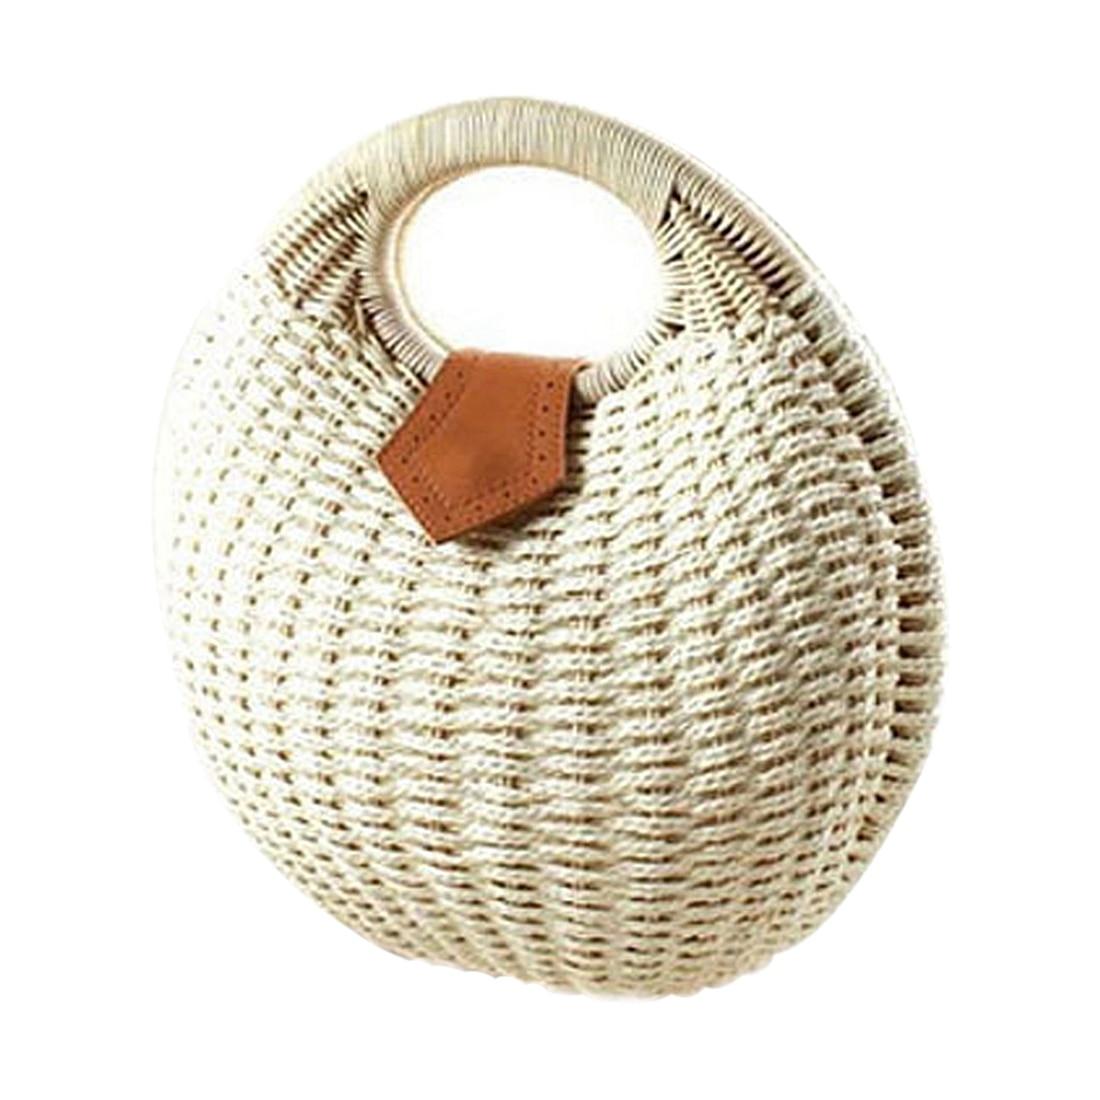 Snails Nest Tote Handbag Summer Beach Bags Woman Straw Bags Womens Handbag Rattan BagSnails Nest Tote Handbag Summer Beach Bags Woman Straw Bags Womens Handbag Rattan Bag